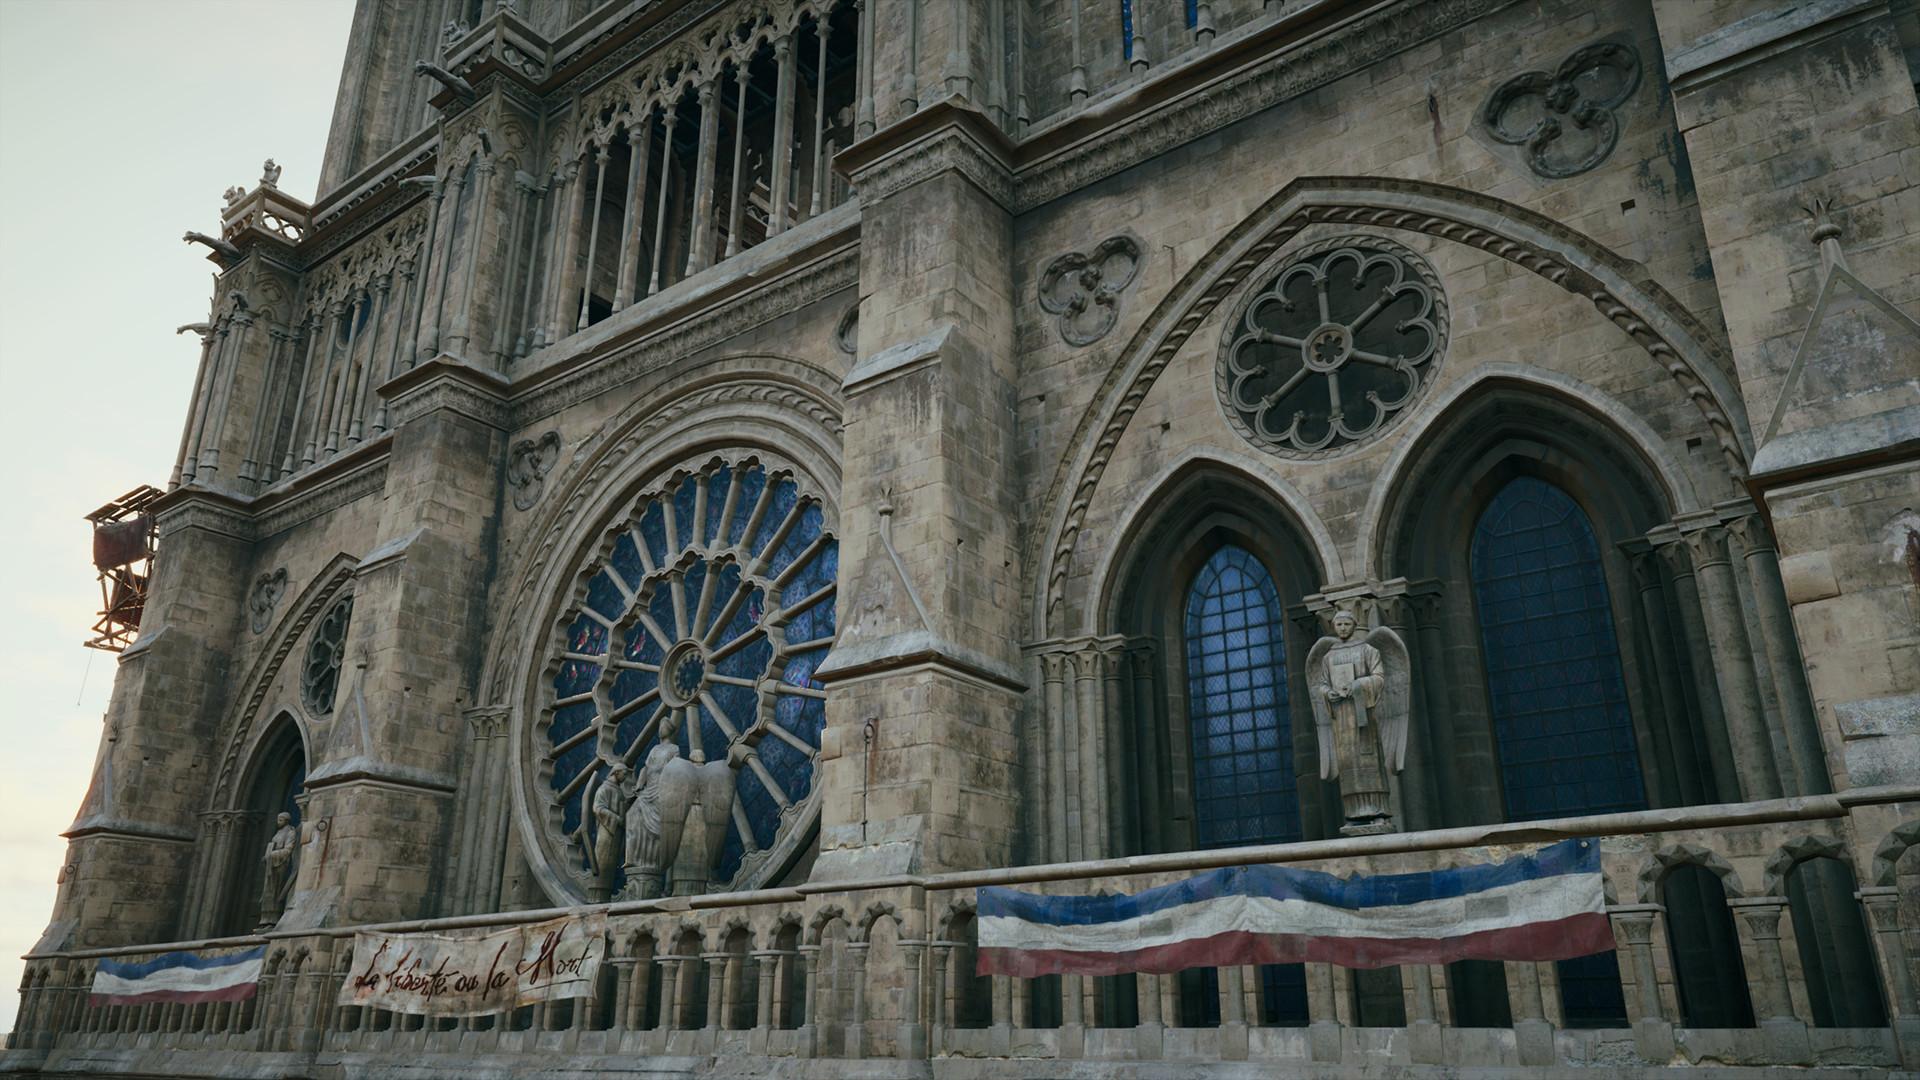 Pascal barriault assassins creed unity screenshot 003